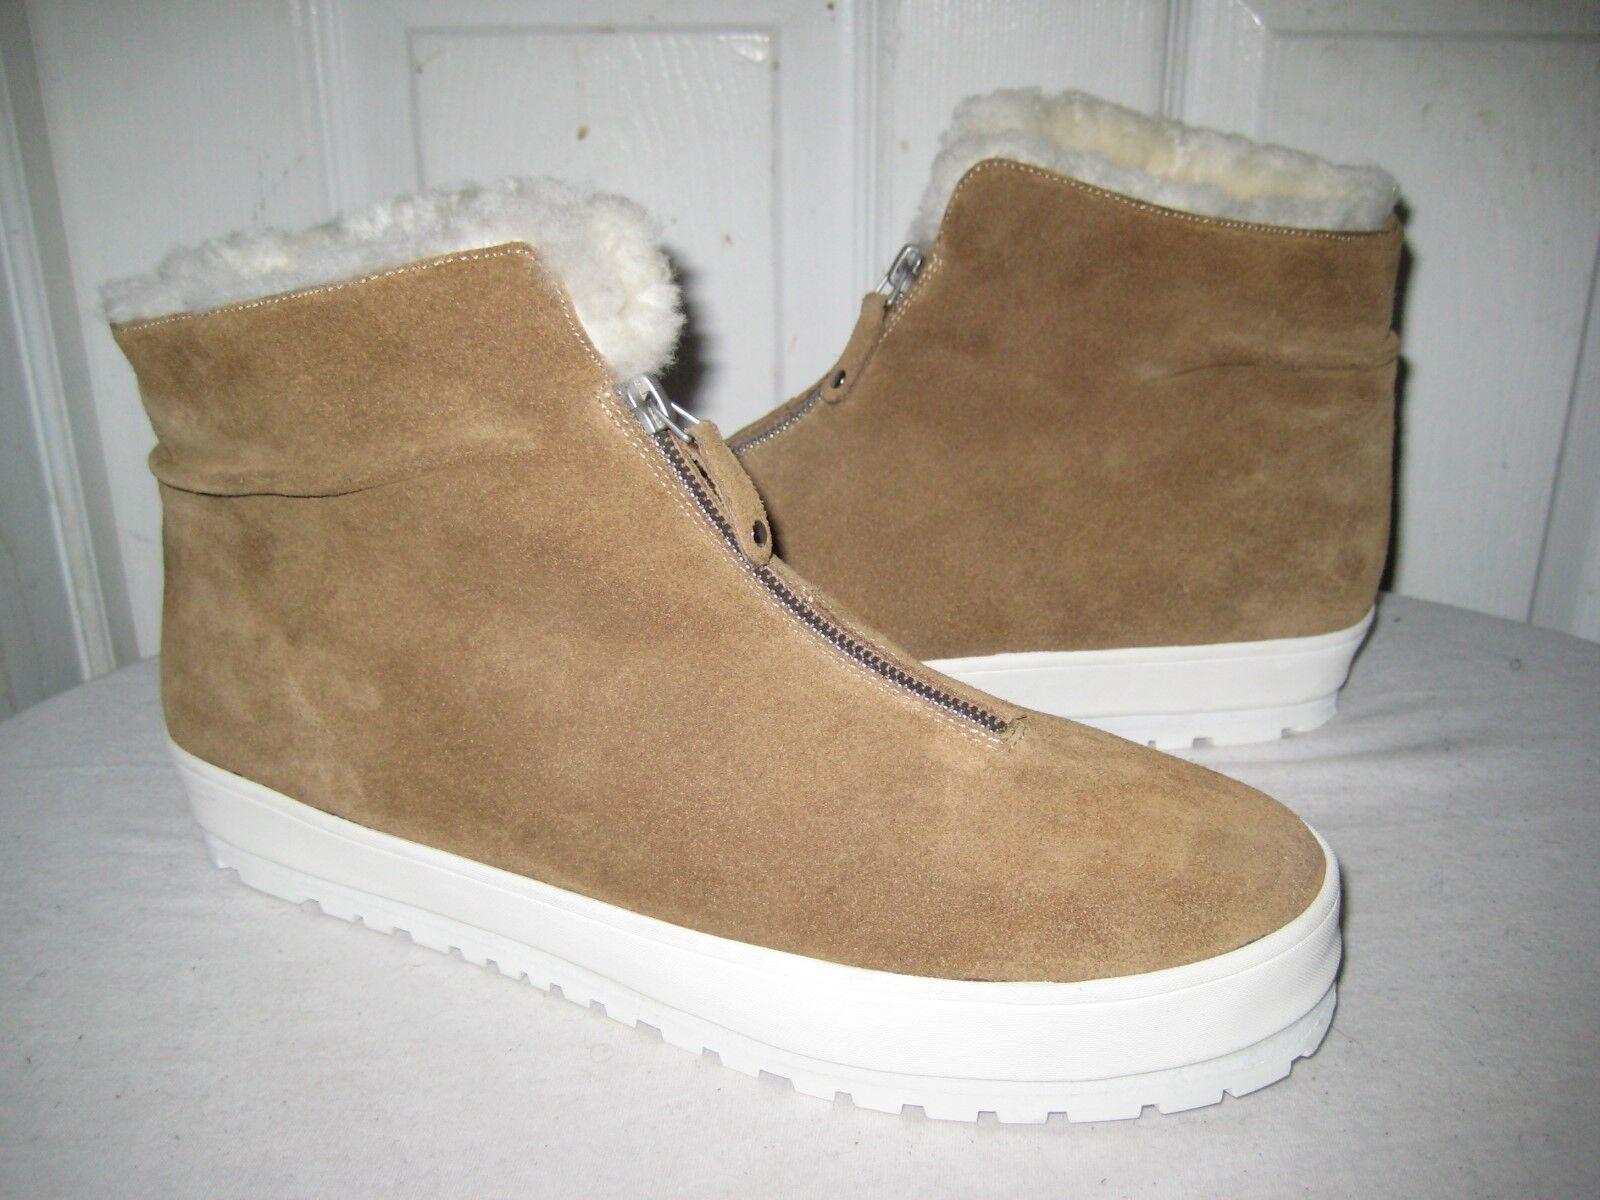 Derek Lam 10 Crosby Gamuza Piel para Invierno Botines Talla Zapatos para mujer Talla Botines 11 M 51e075